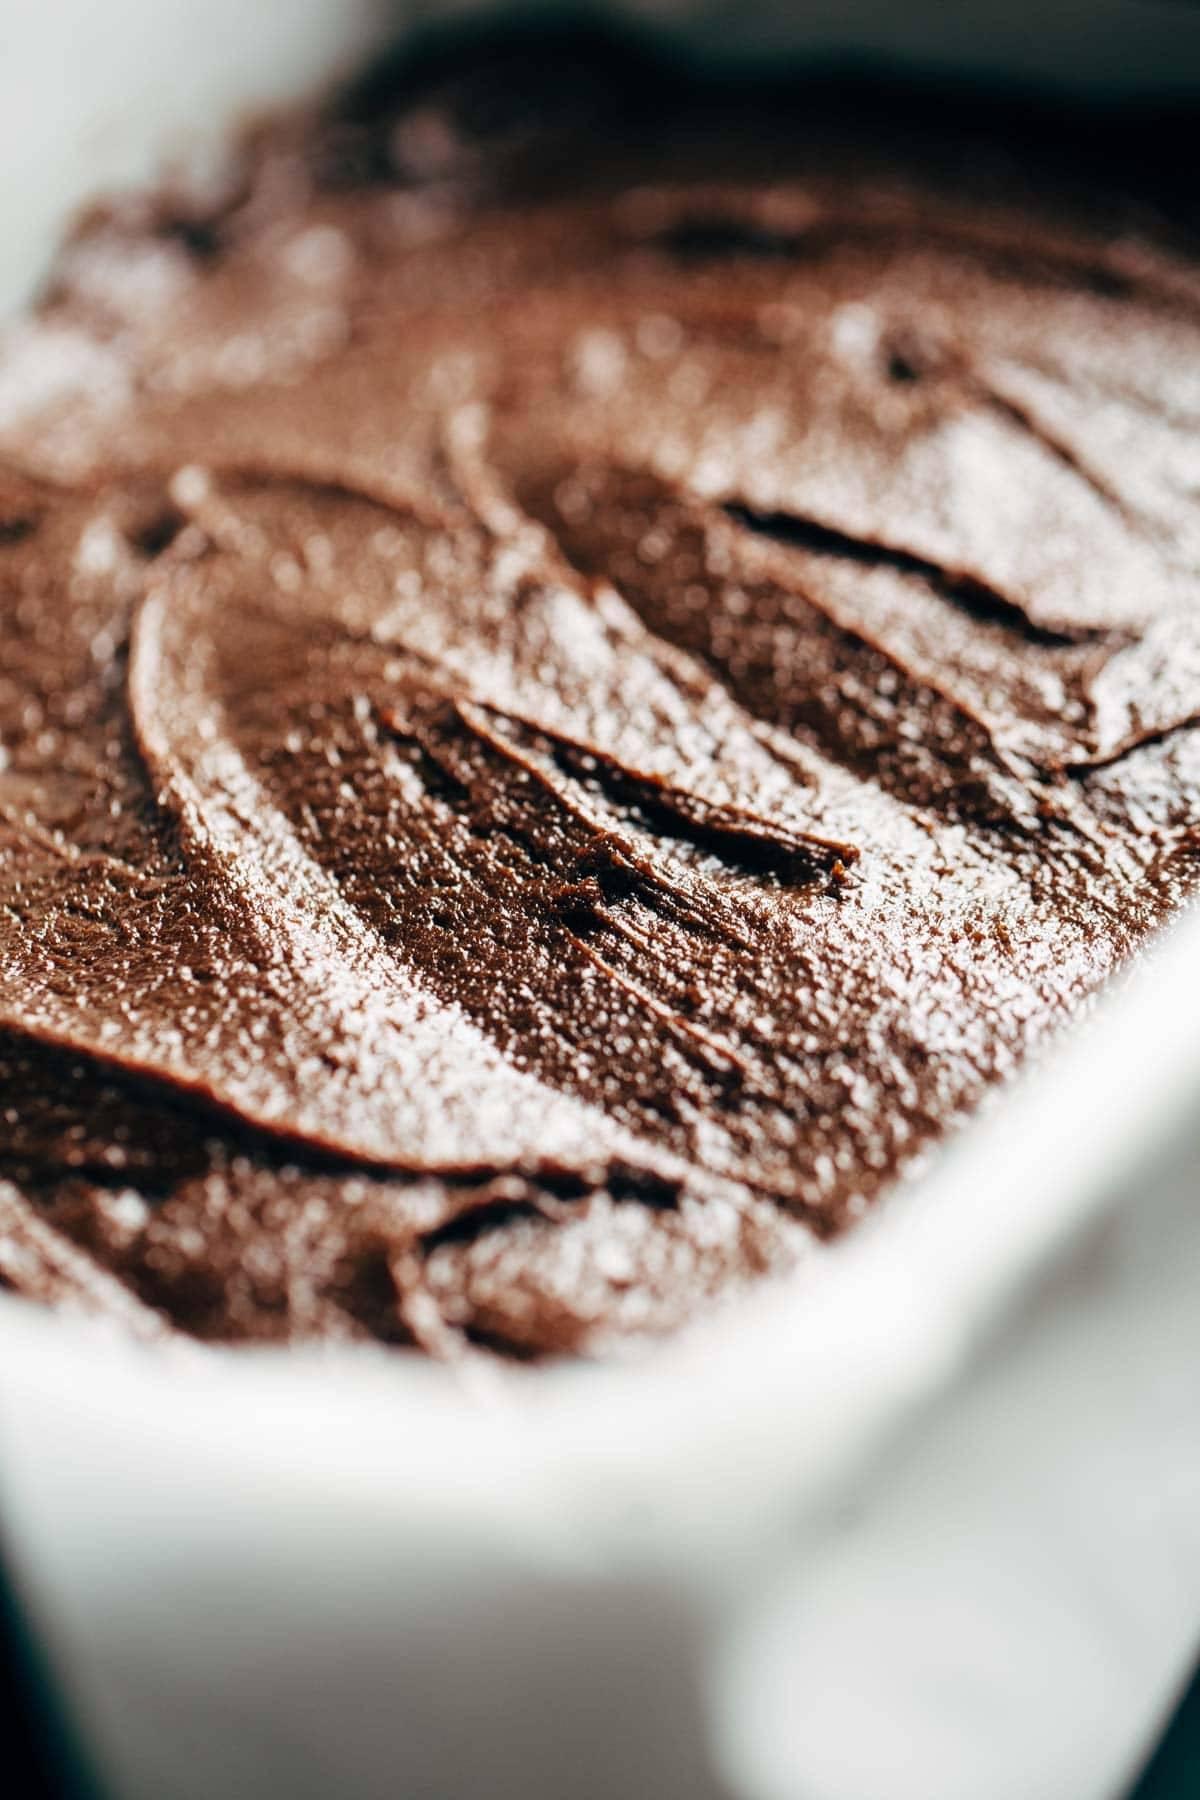 Espresso brownie batter in a dish.